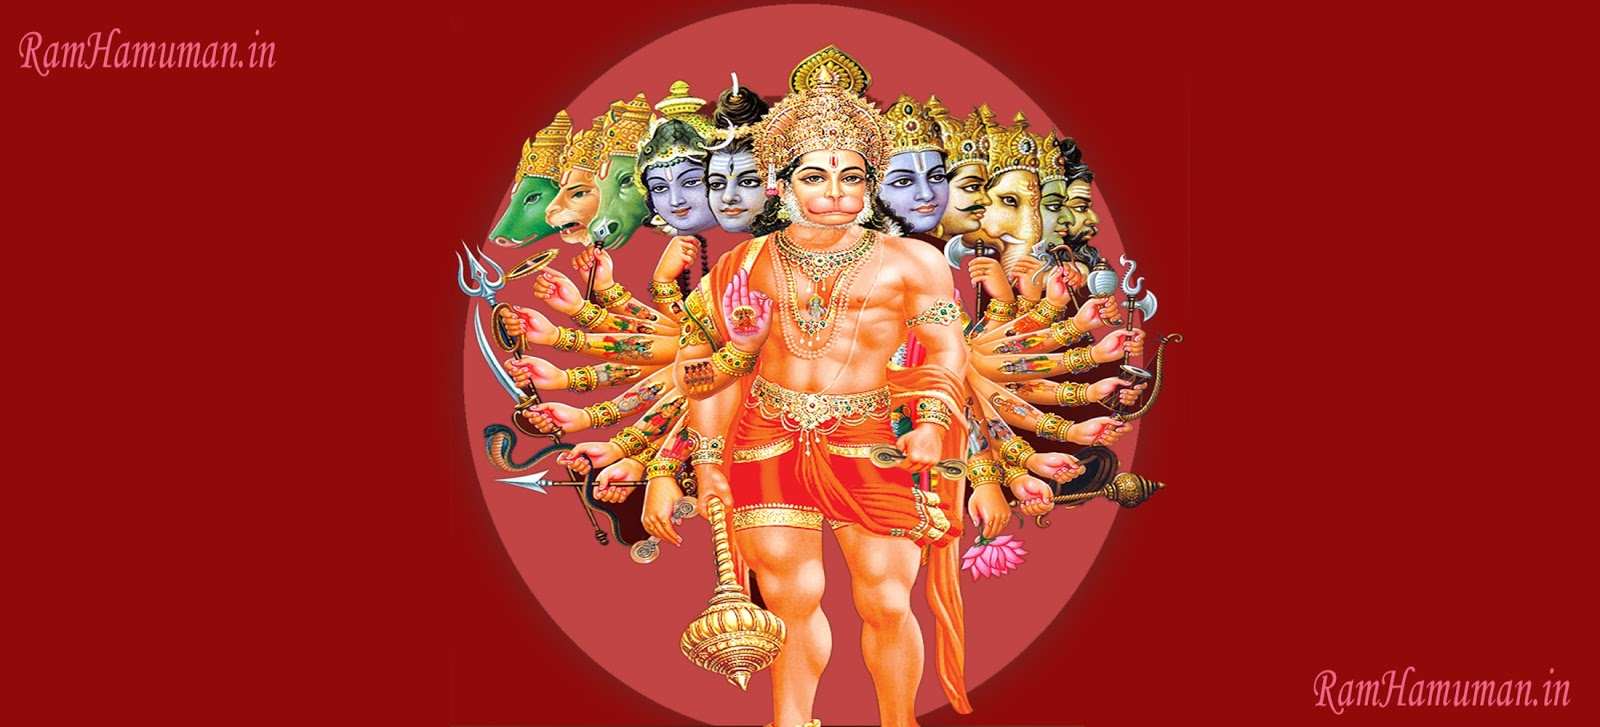 Hd wallpaper hanuman - 9 Best Hd Wallpapers Lord Ram With Bhakt Hanuman Free Download 2017